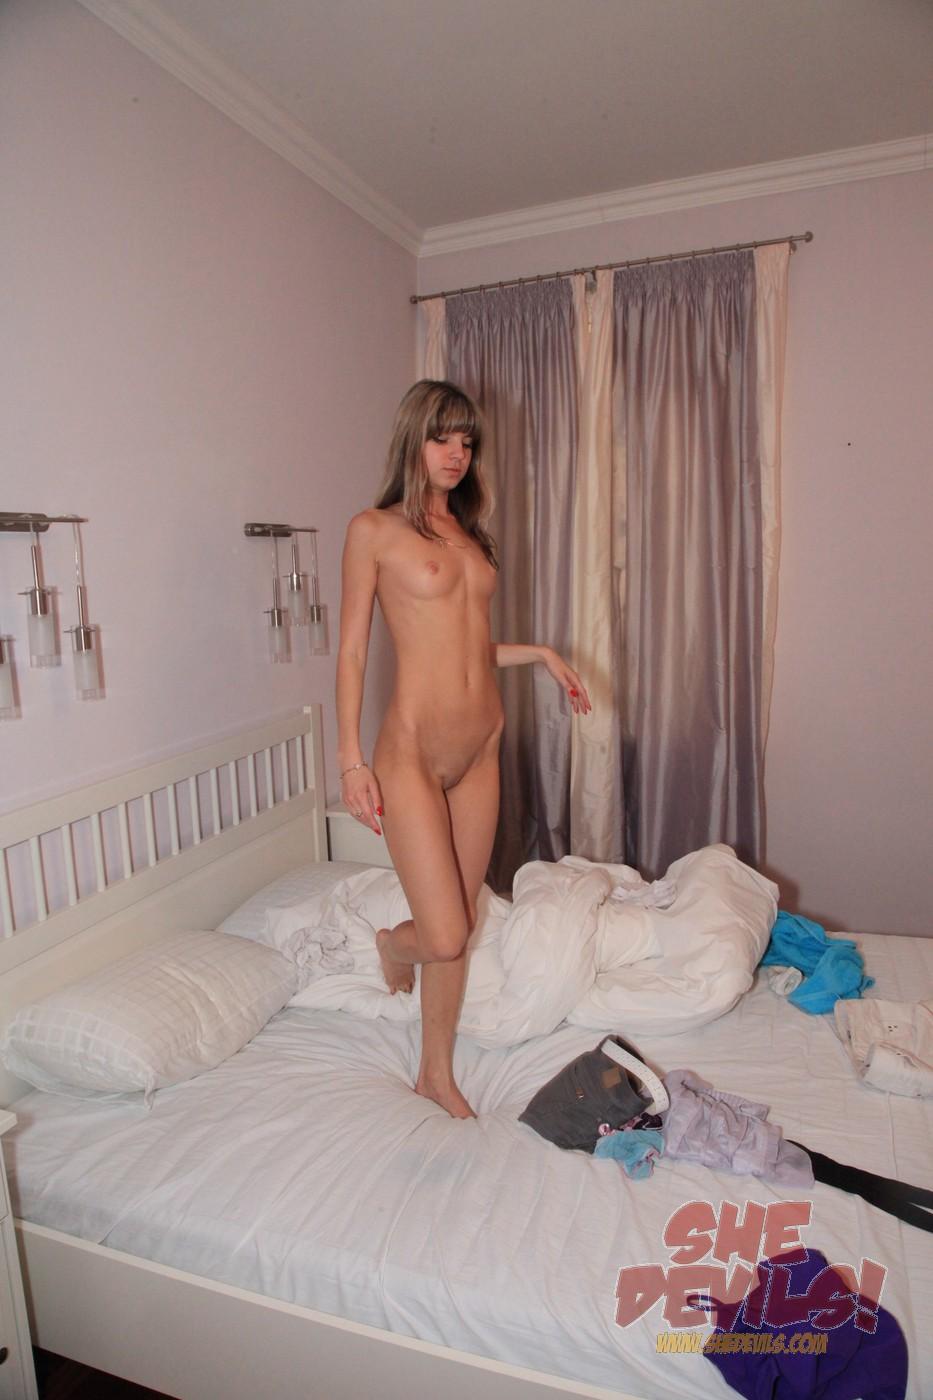 desi nude girl little pussy